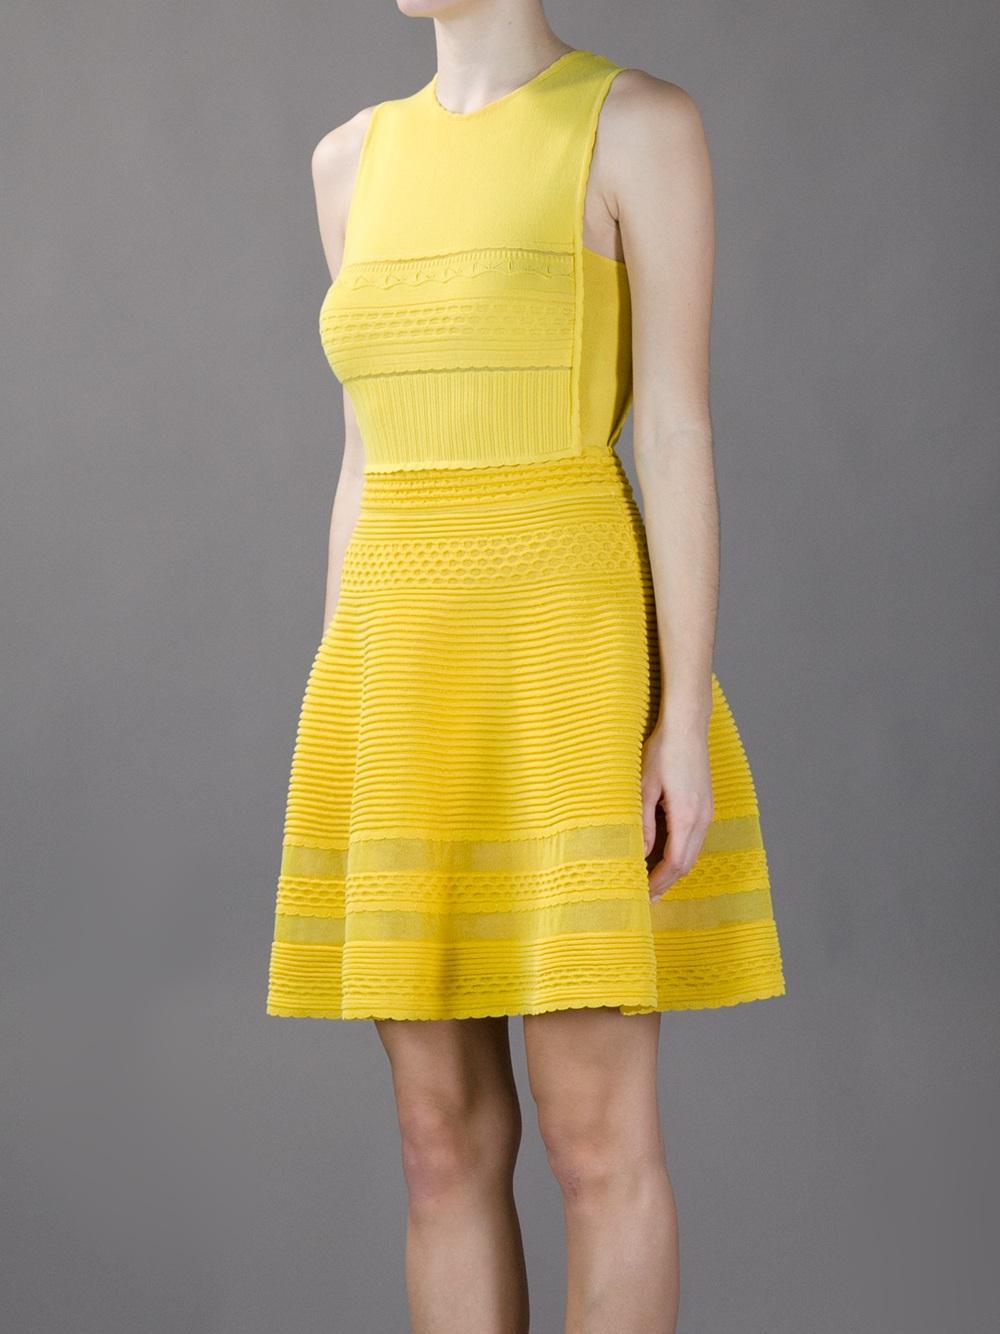 M missoni yellow dress.